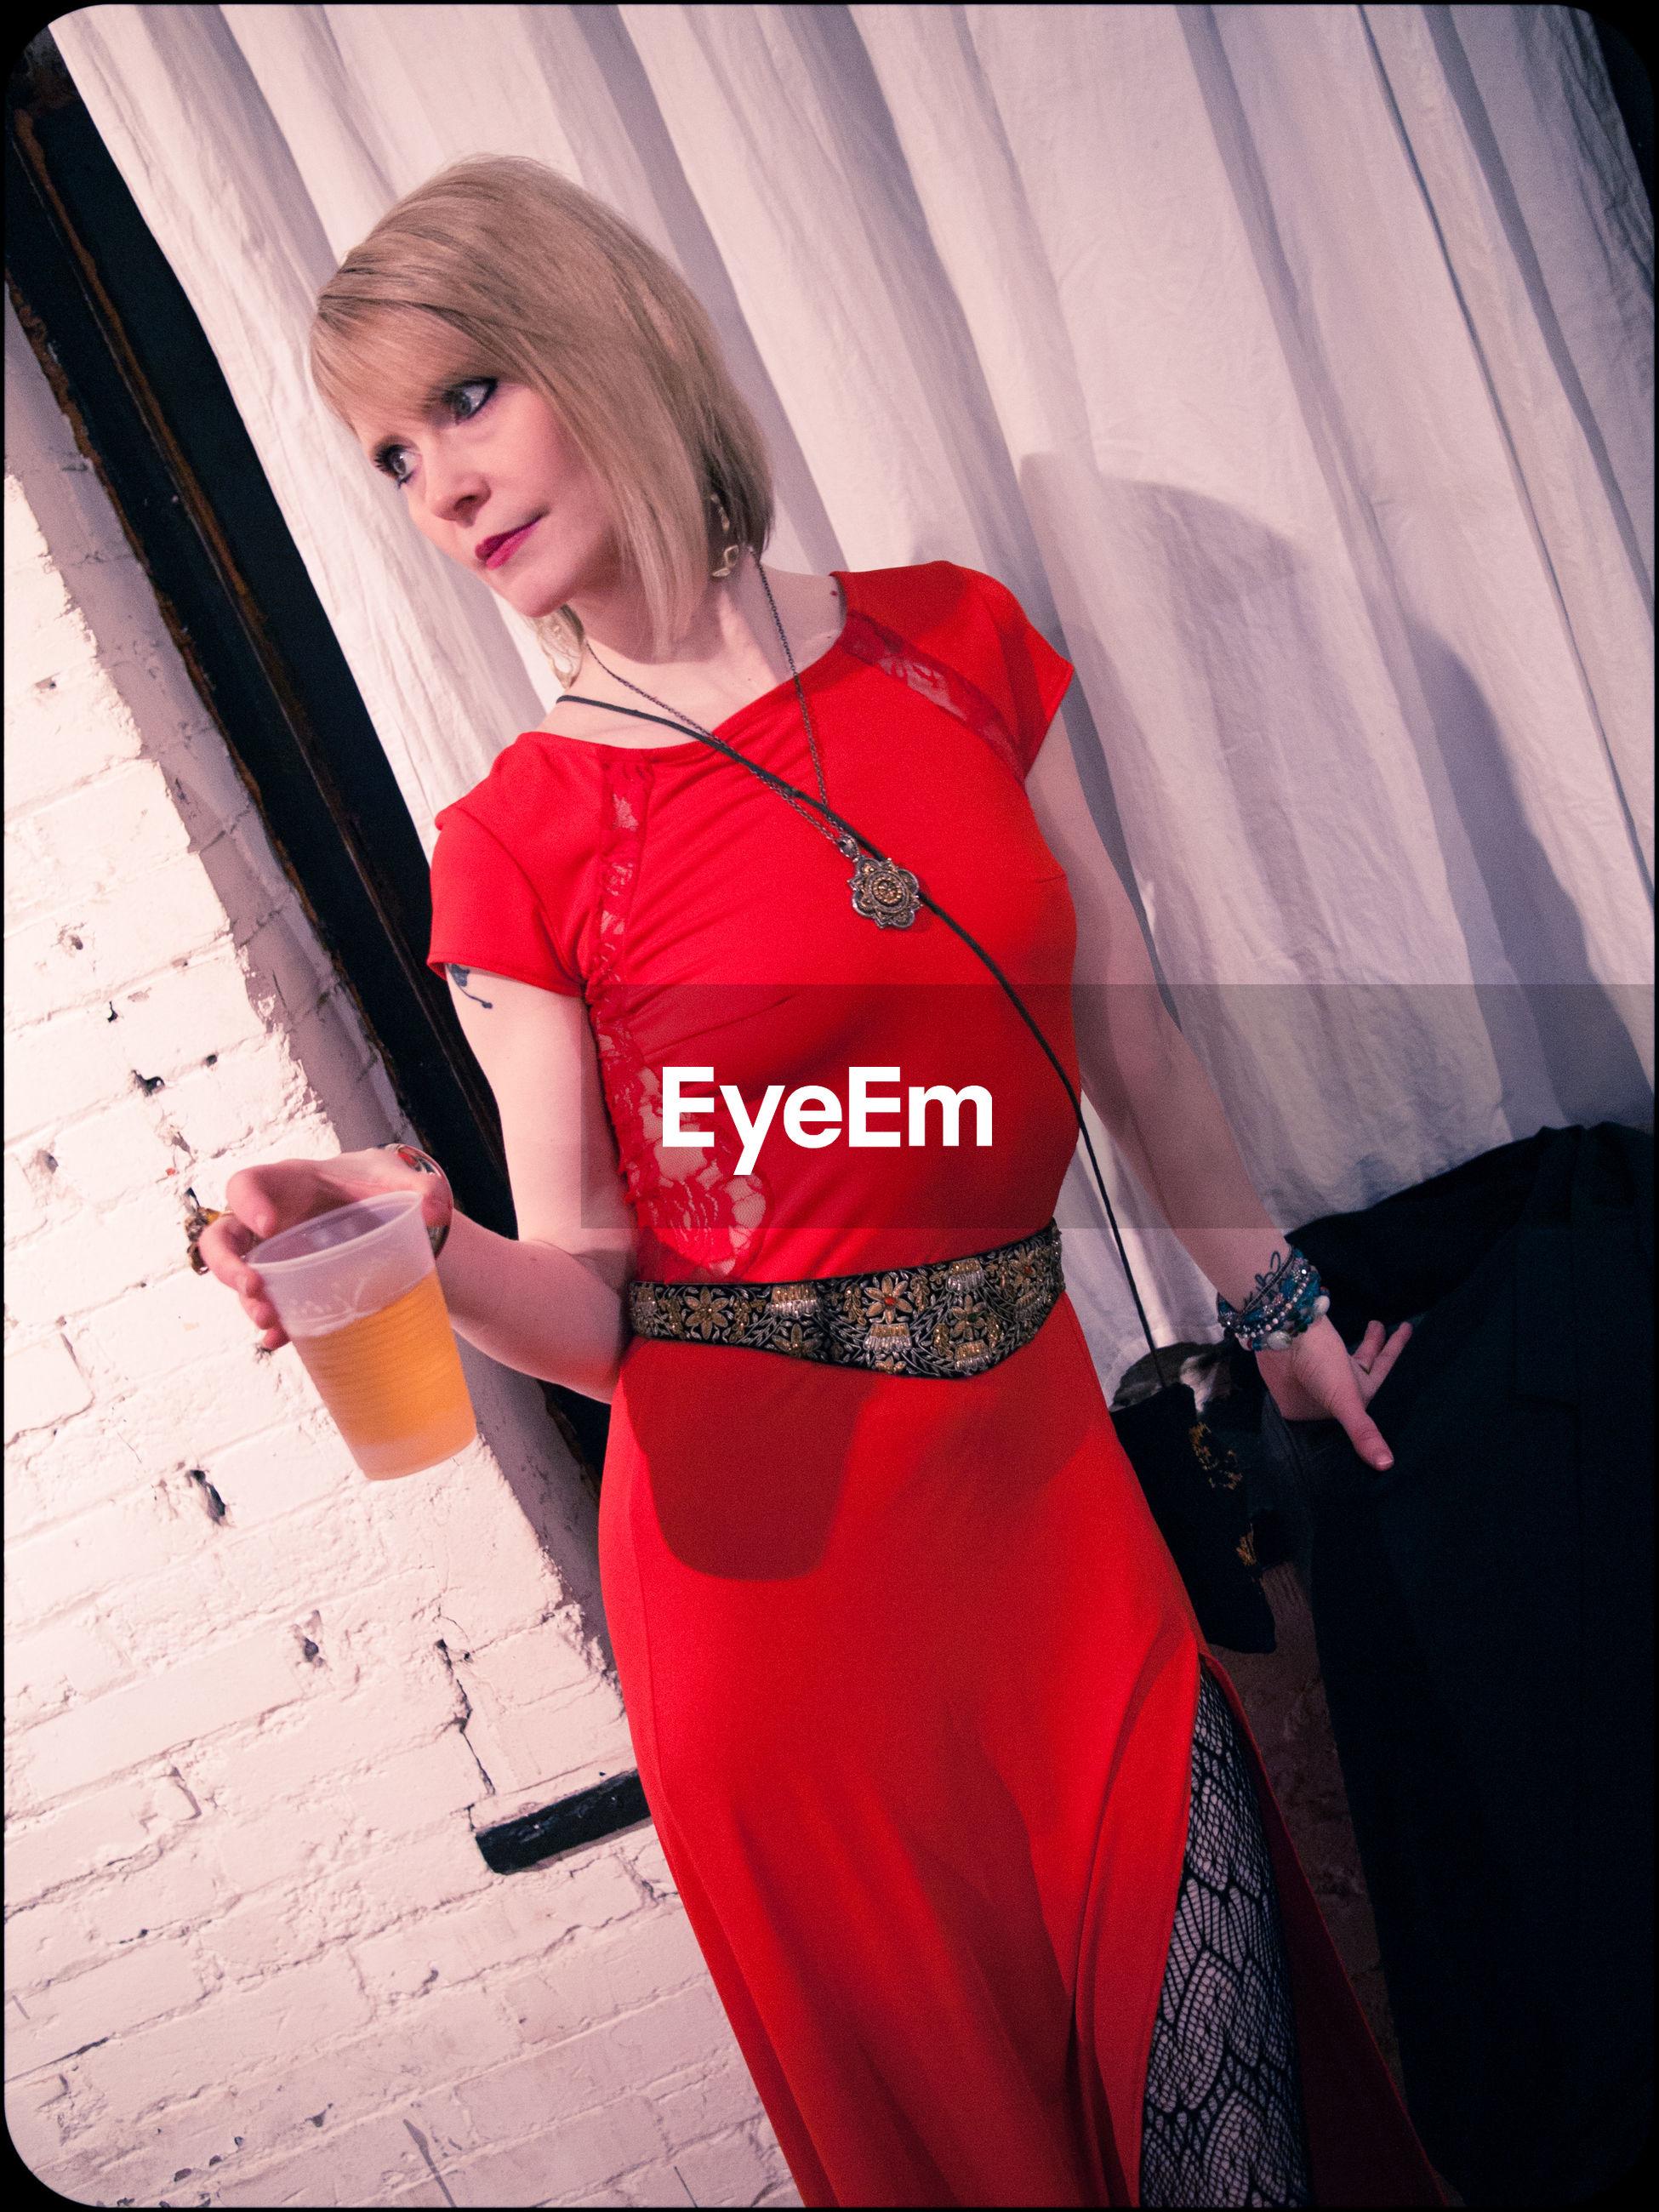 PORTRAIT OF WOMAN IN RED DRESS